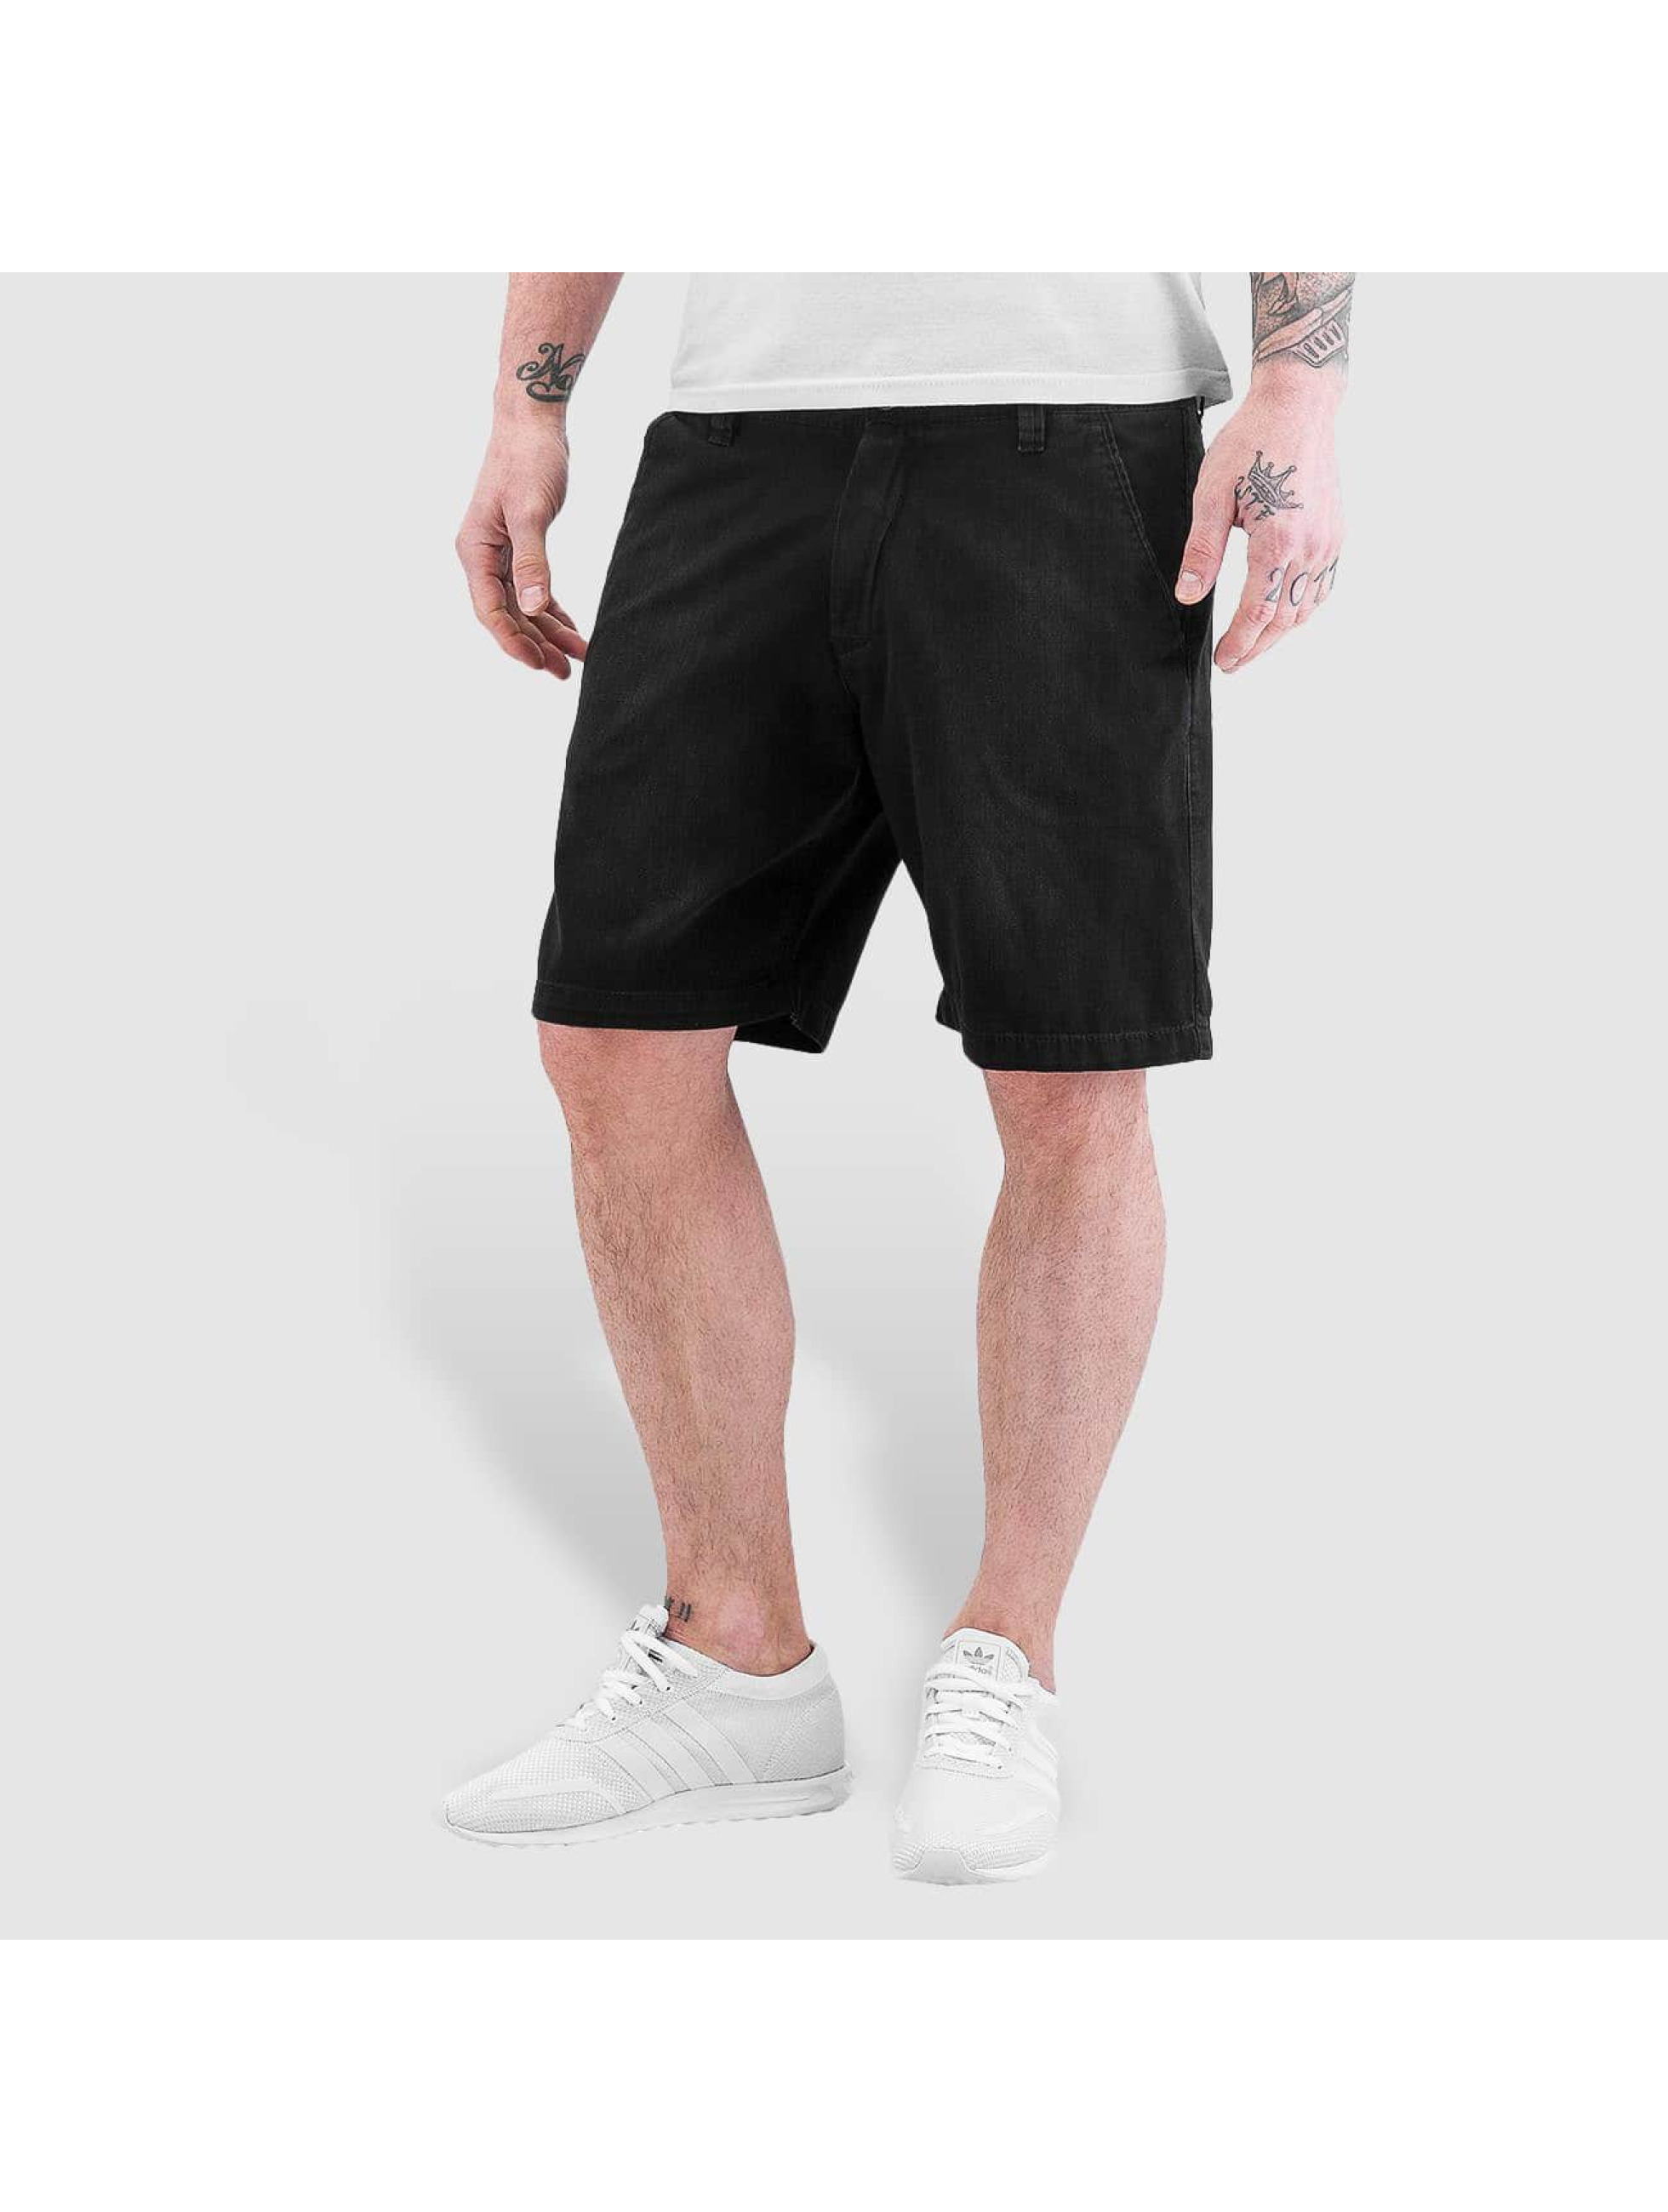 Reell Jeans Short Miami Chino noir